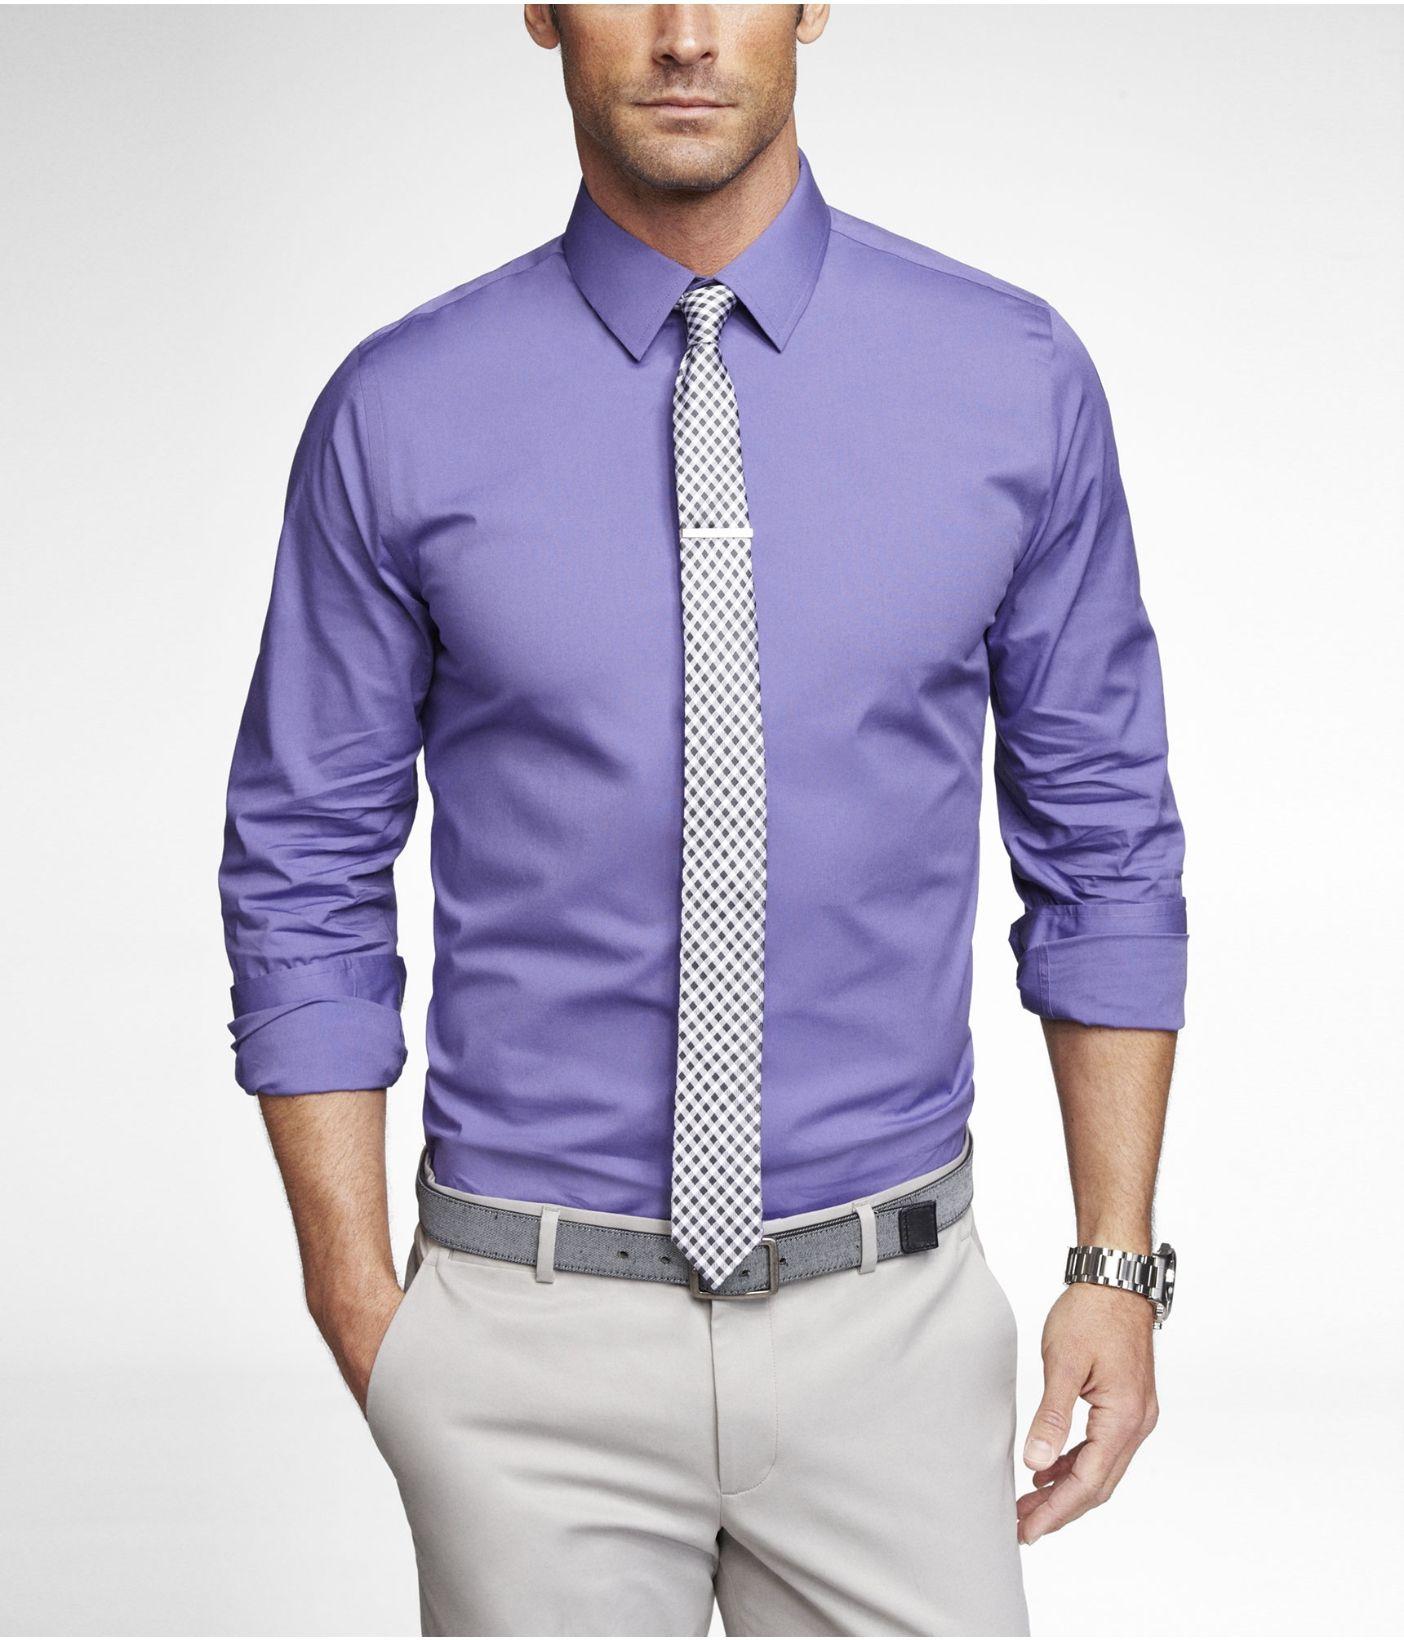 purple dress shirt, black and white tie, light grey pant, gray ...